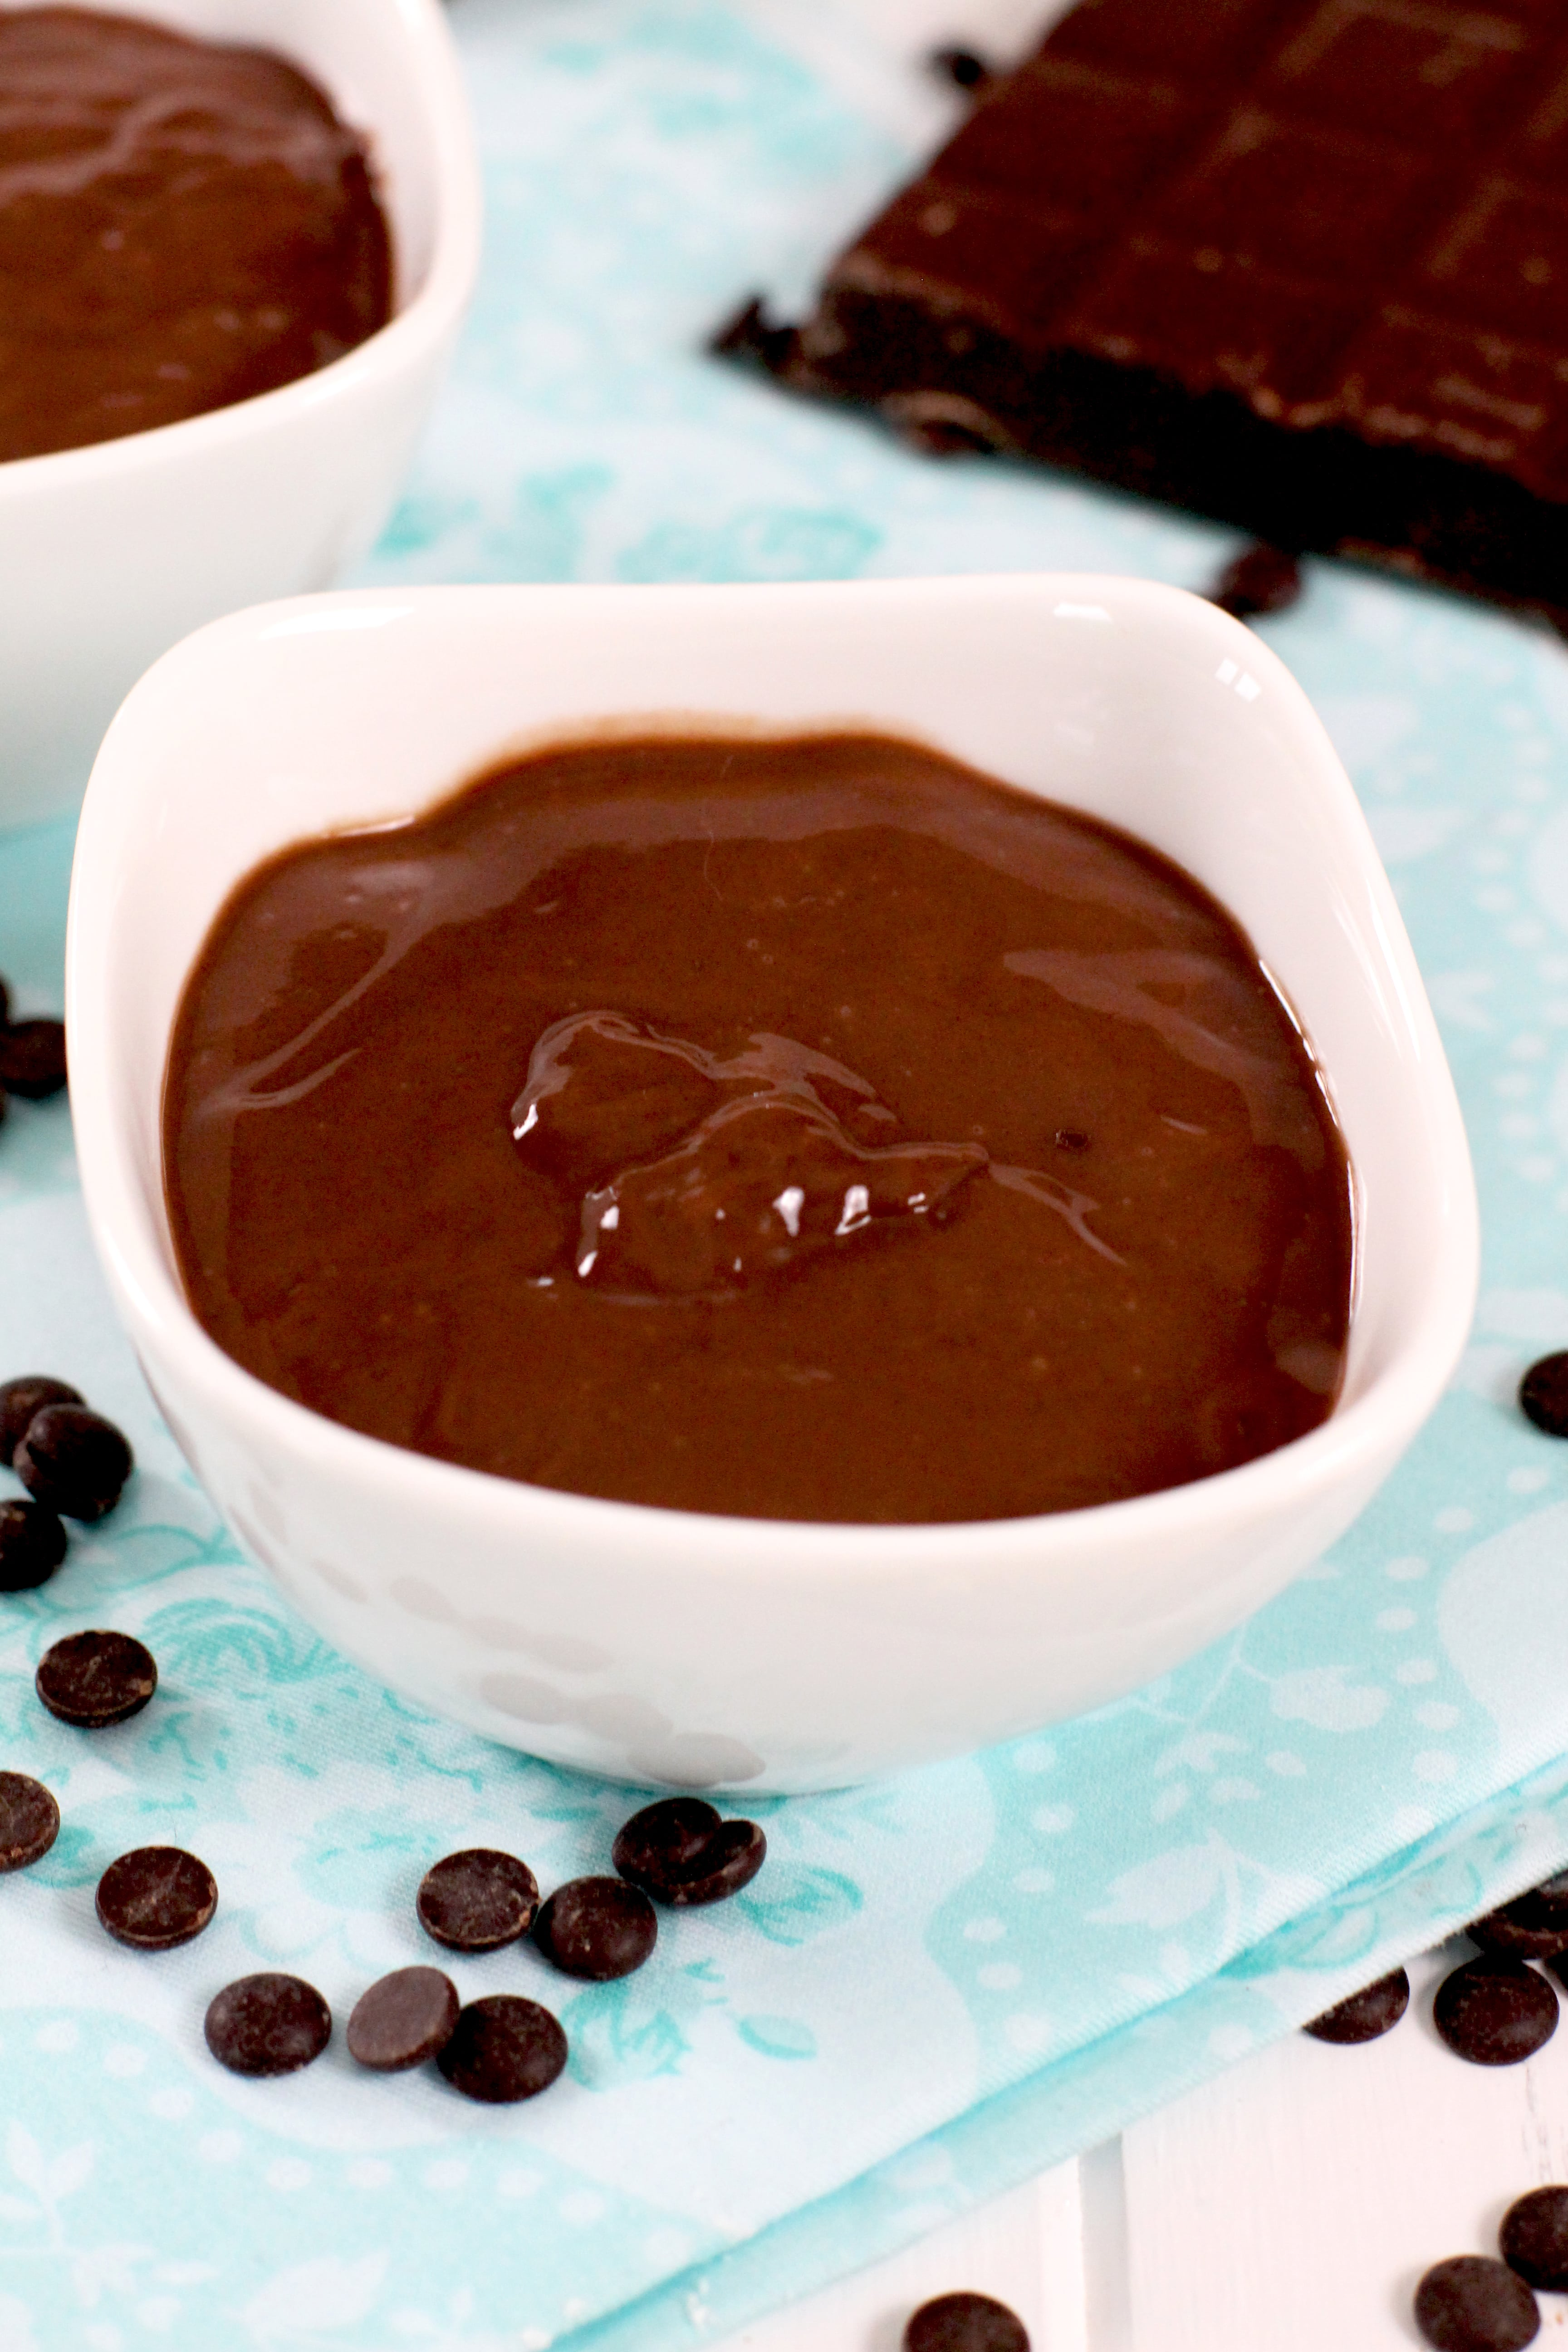 Natillas de chocolate caseras - Como hacer natillas caseras